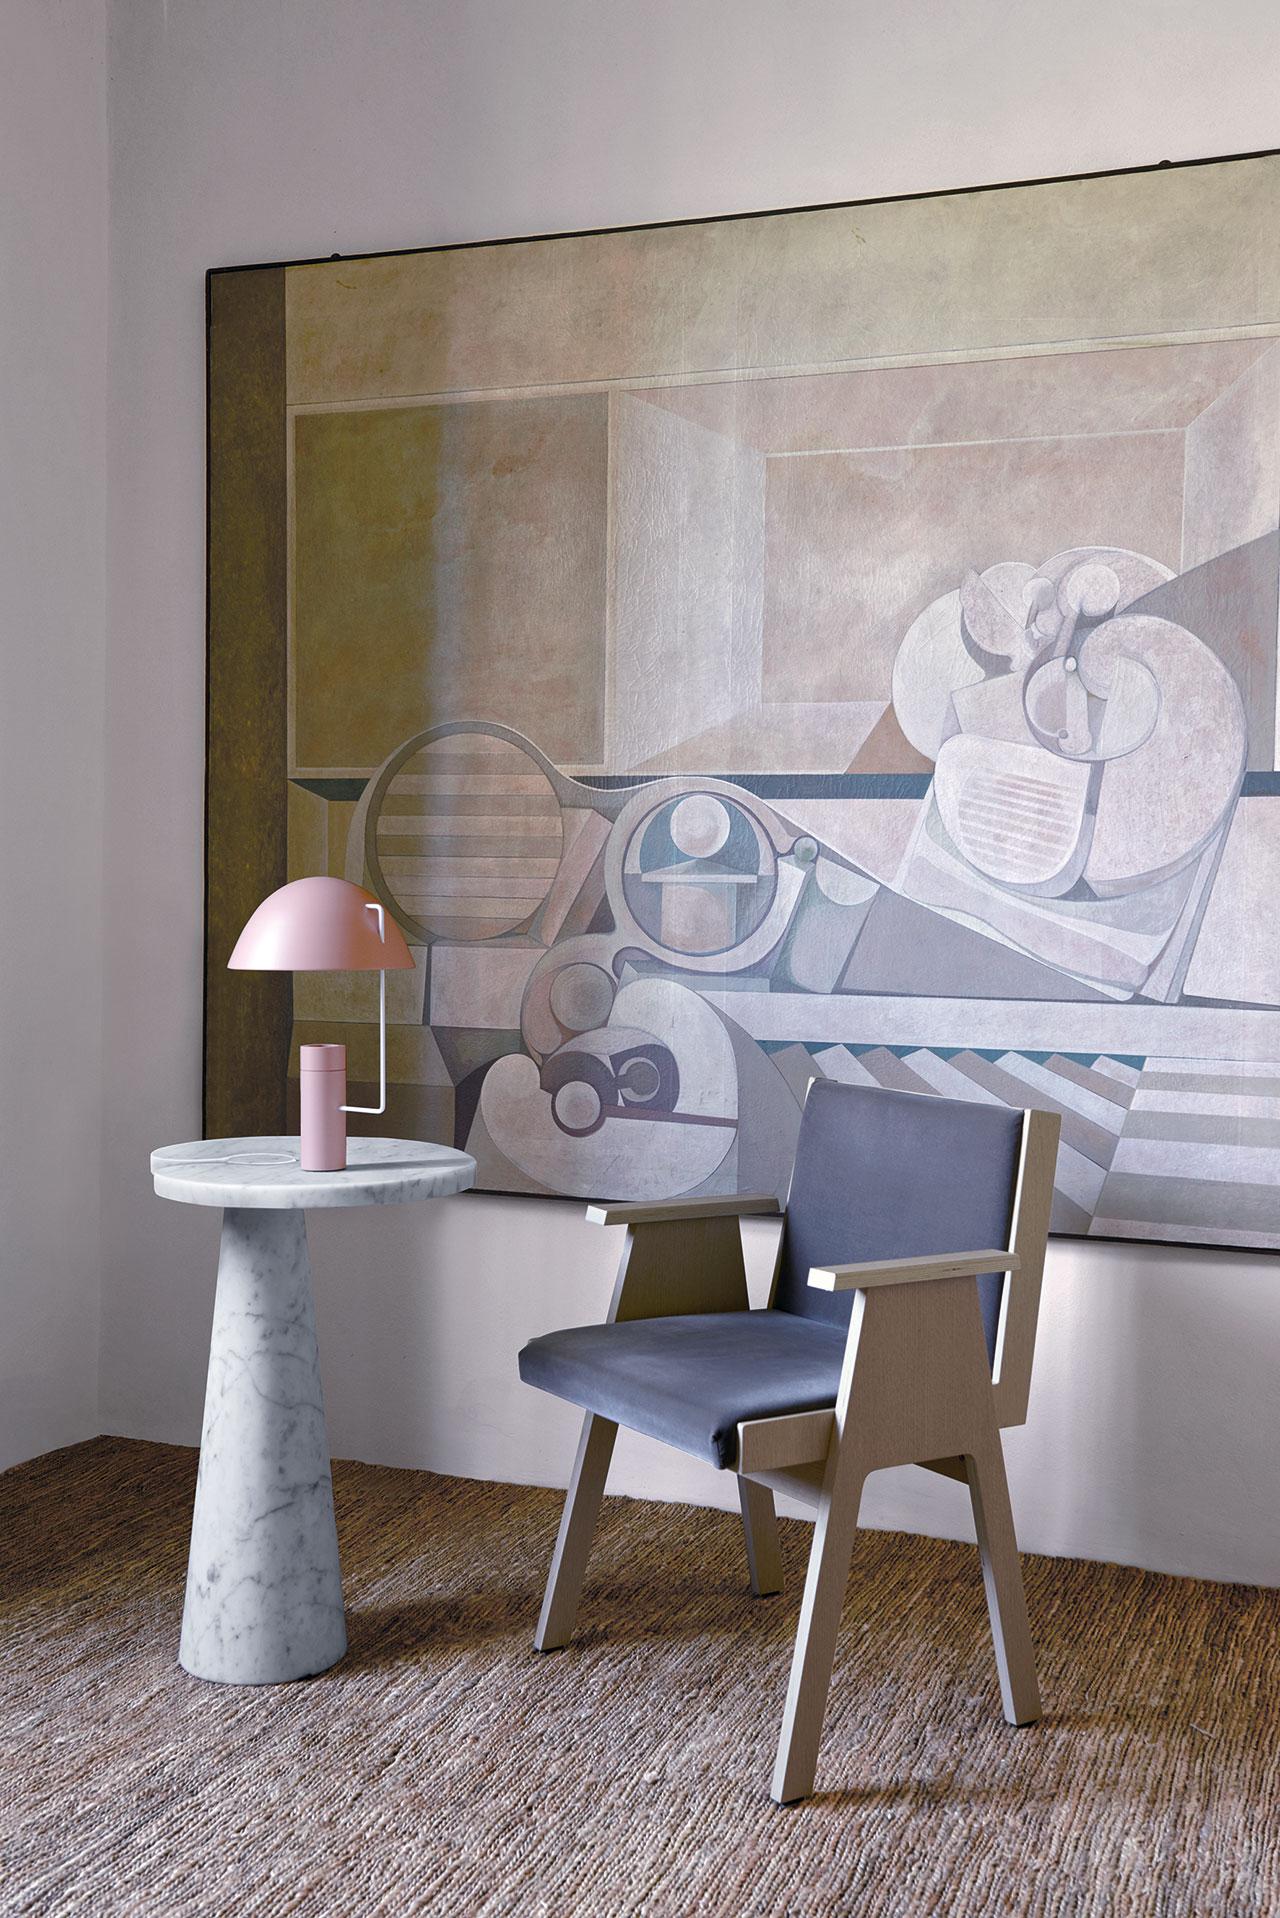 Eros table and Club 44 chair, The Mangiarotti Collection, Agapecasa© Agape